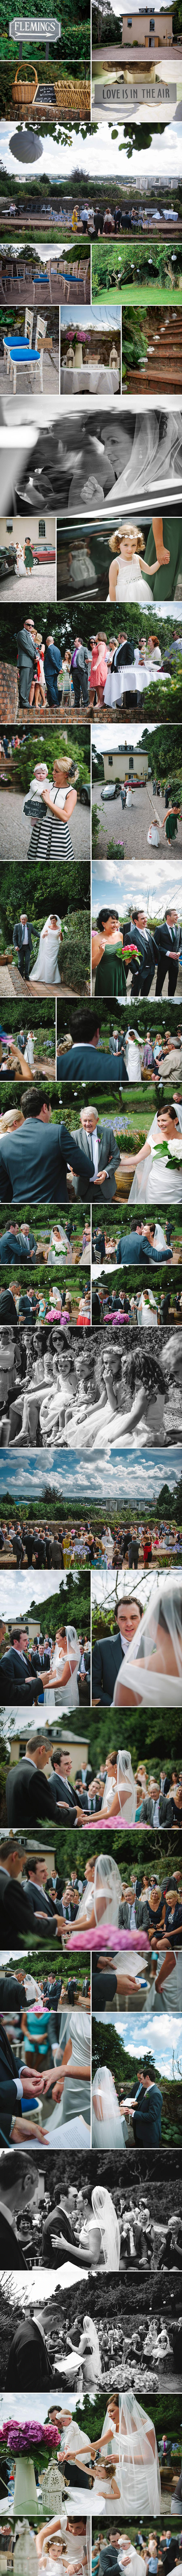 L + J | Garden Outdoor Wedding | Flemings Restaurant | Cork Wedding Photography 17